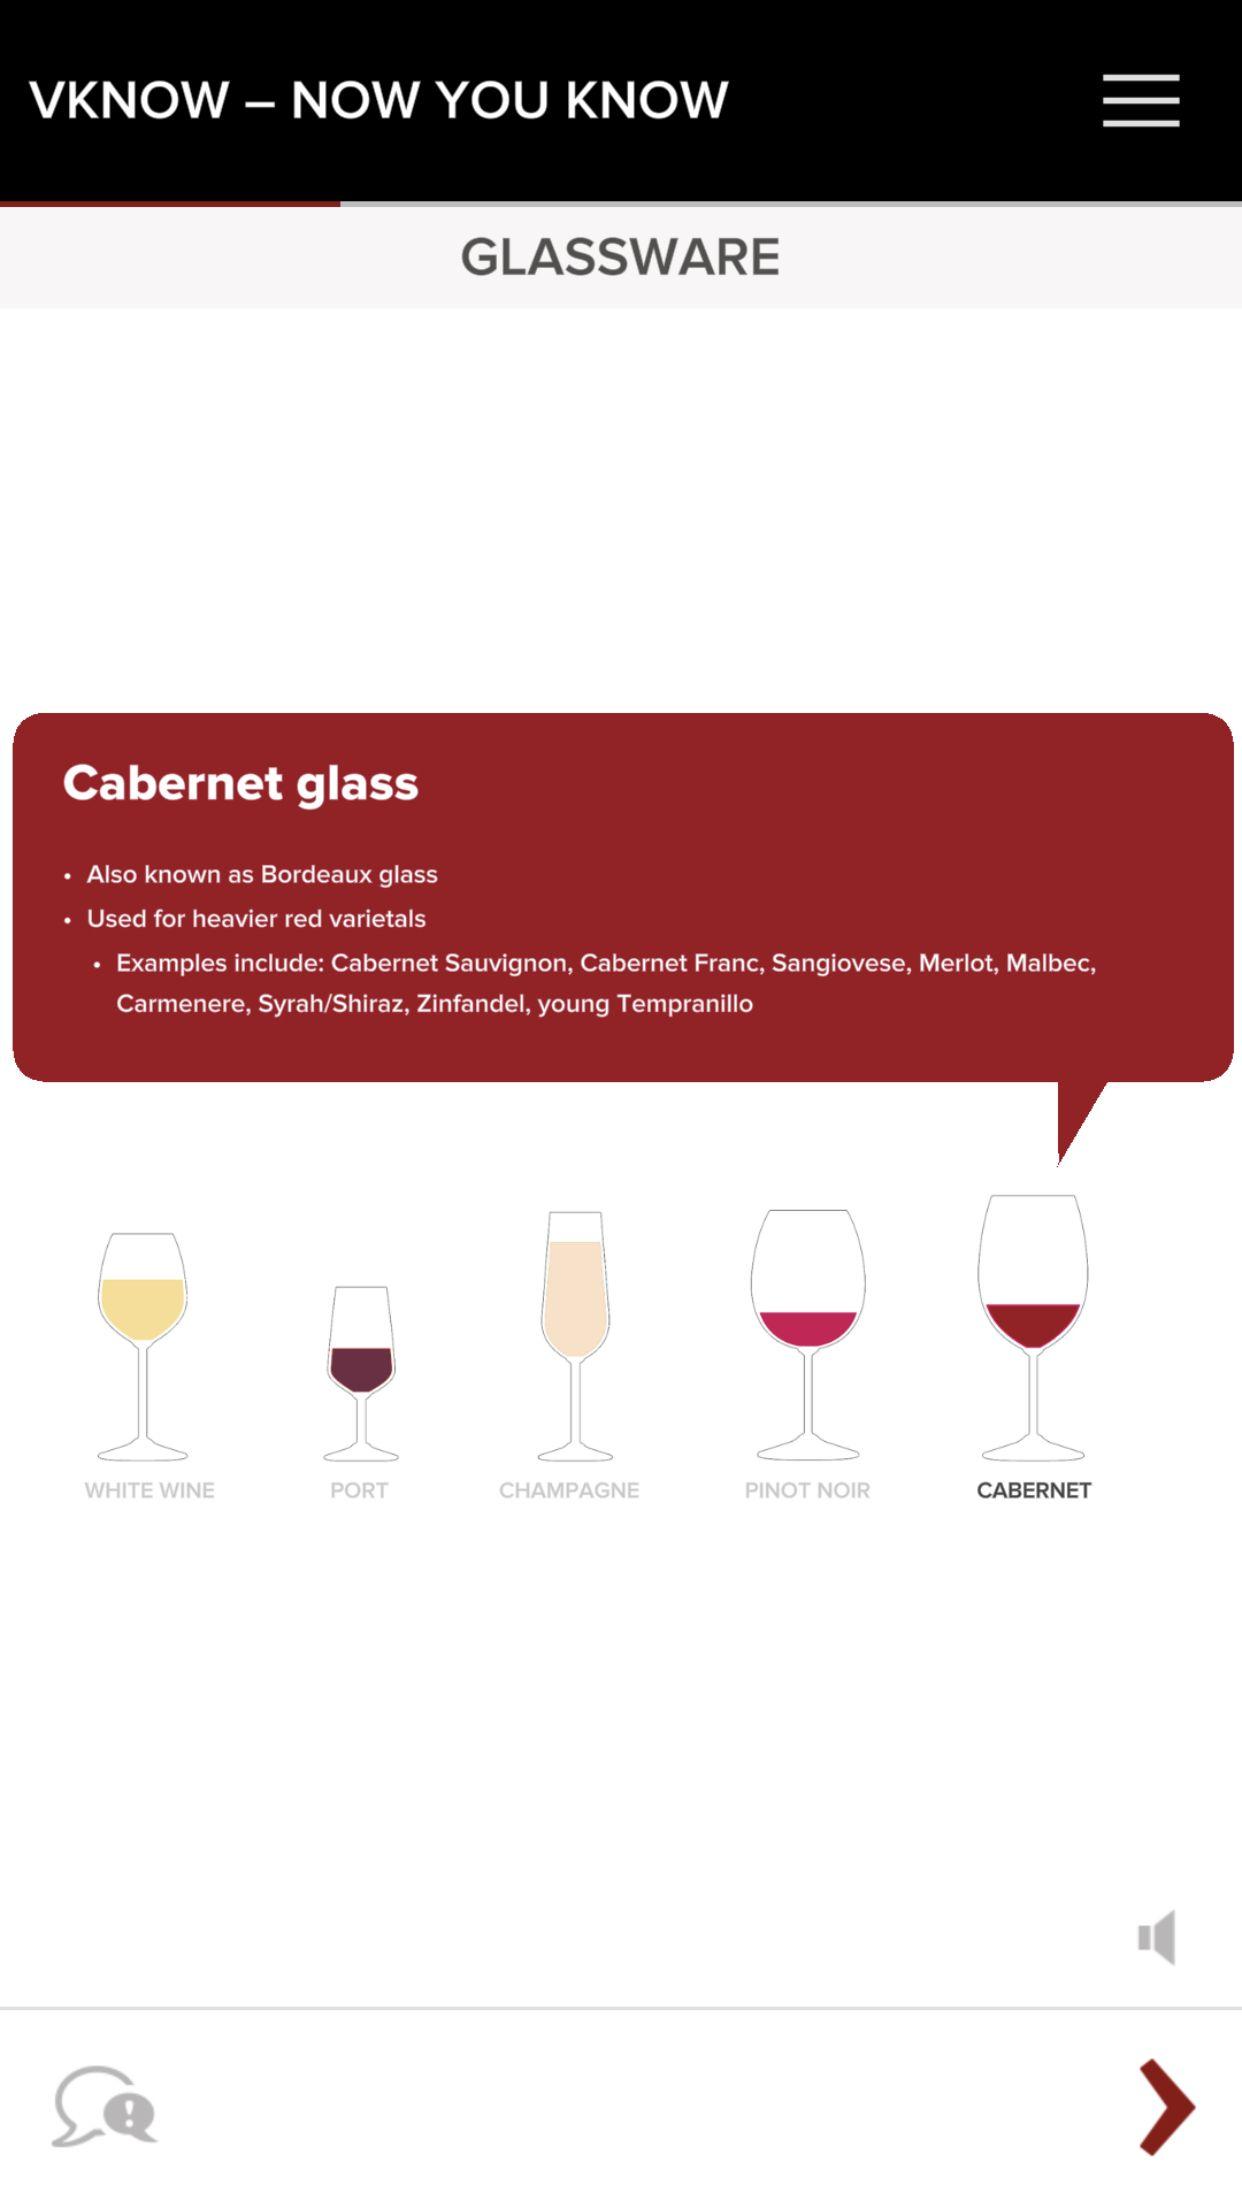 Bordeaux Style Glass With Images Malbec Cabernet Franc Syrah Shiraz